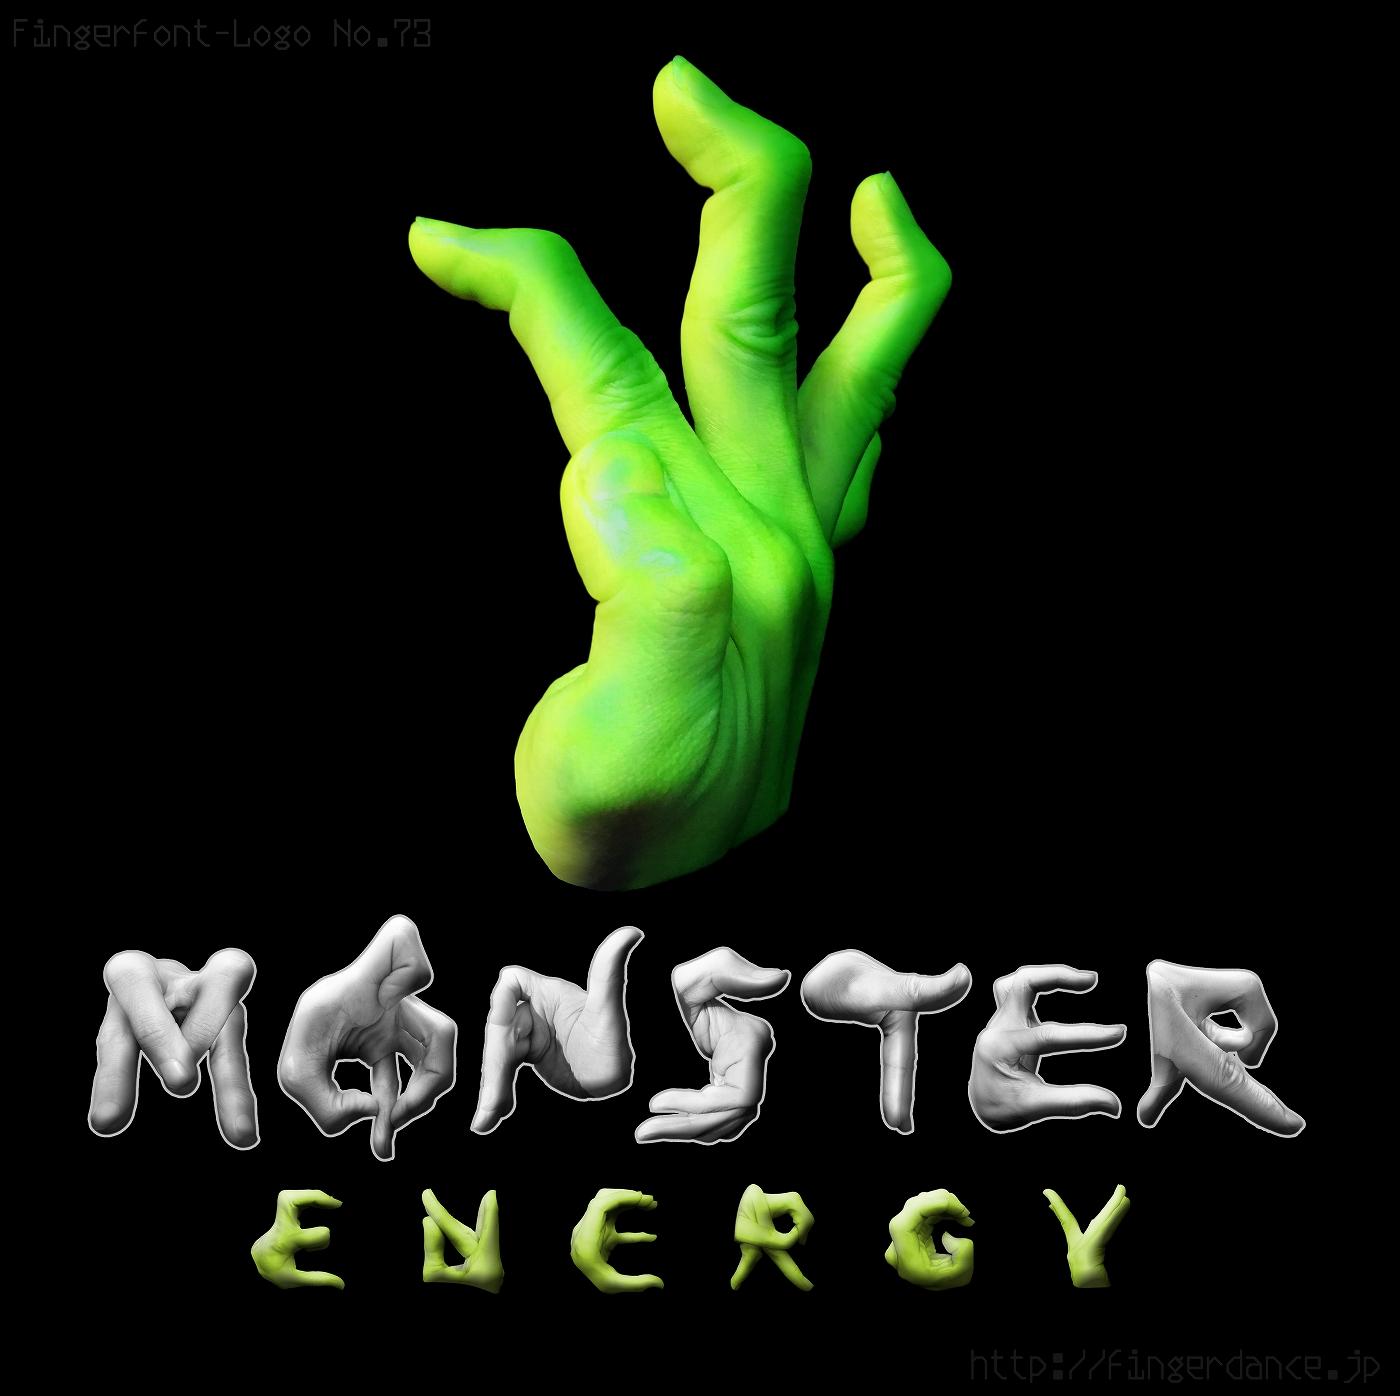 MONSTERENEGY-fingerhttp://fingerdance.jp/L/logohand モンスターエナジー・フィンガーロゴハンド手指